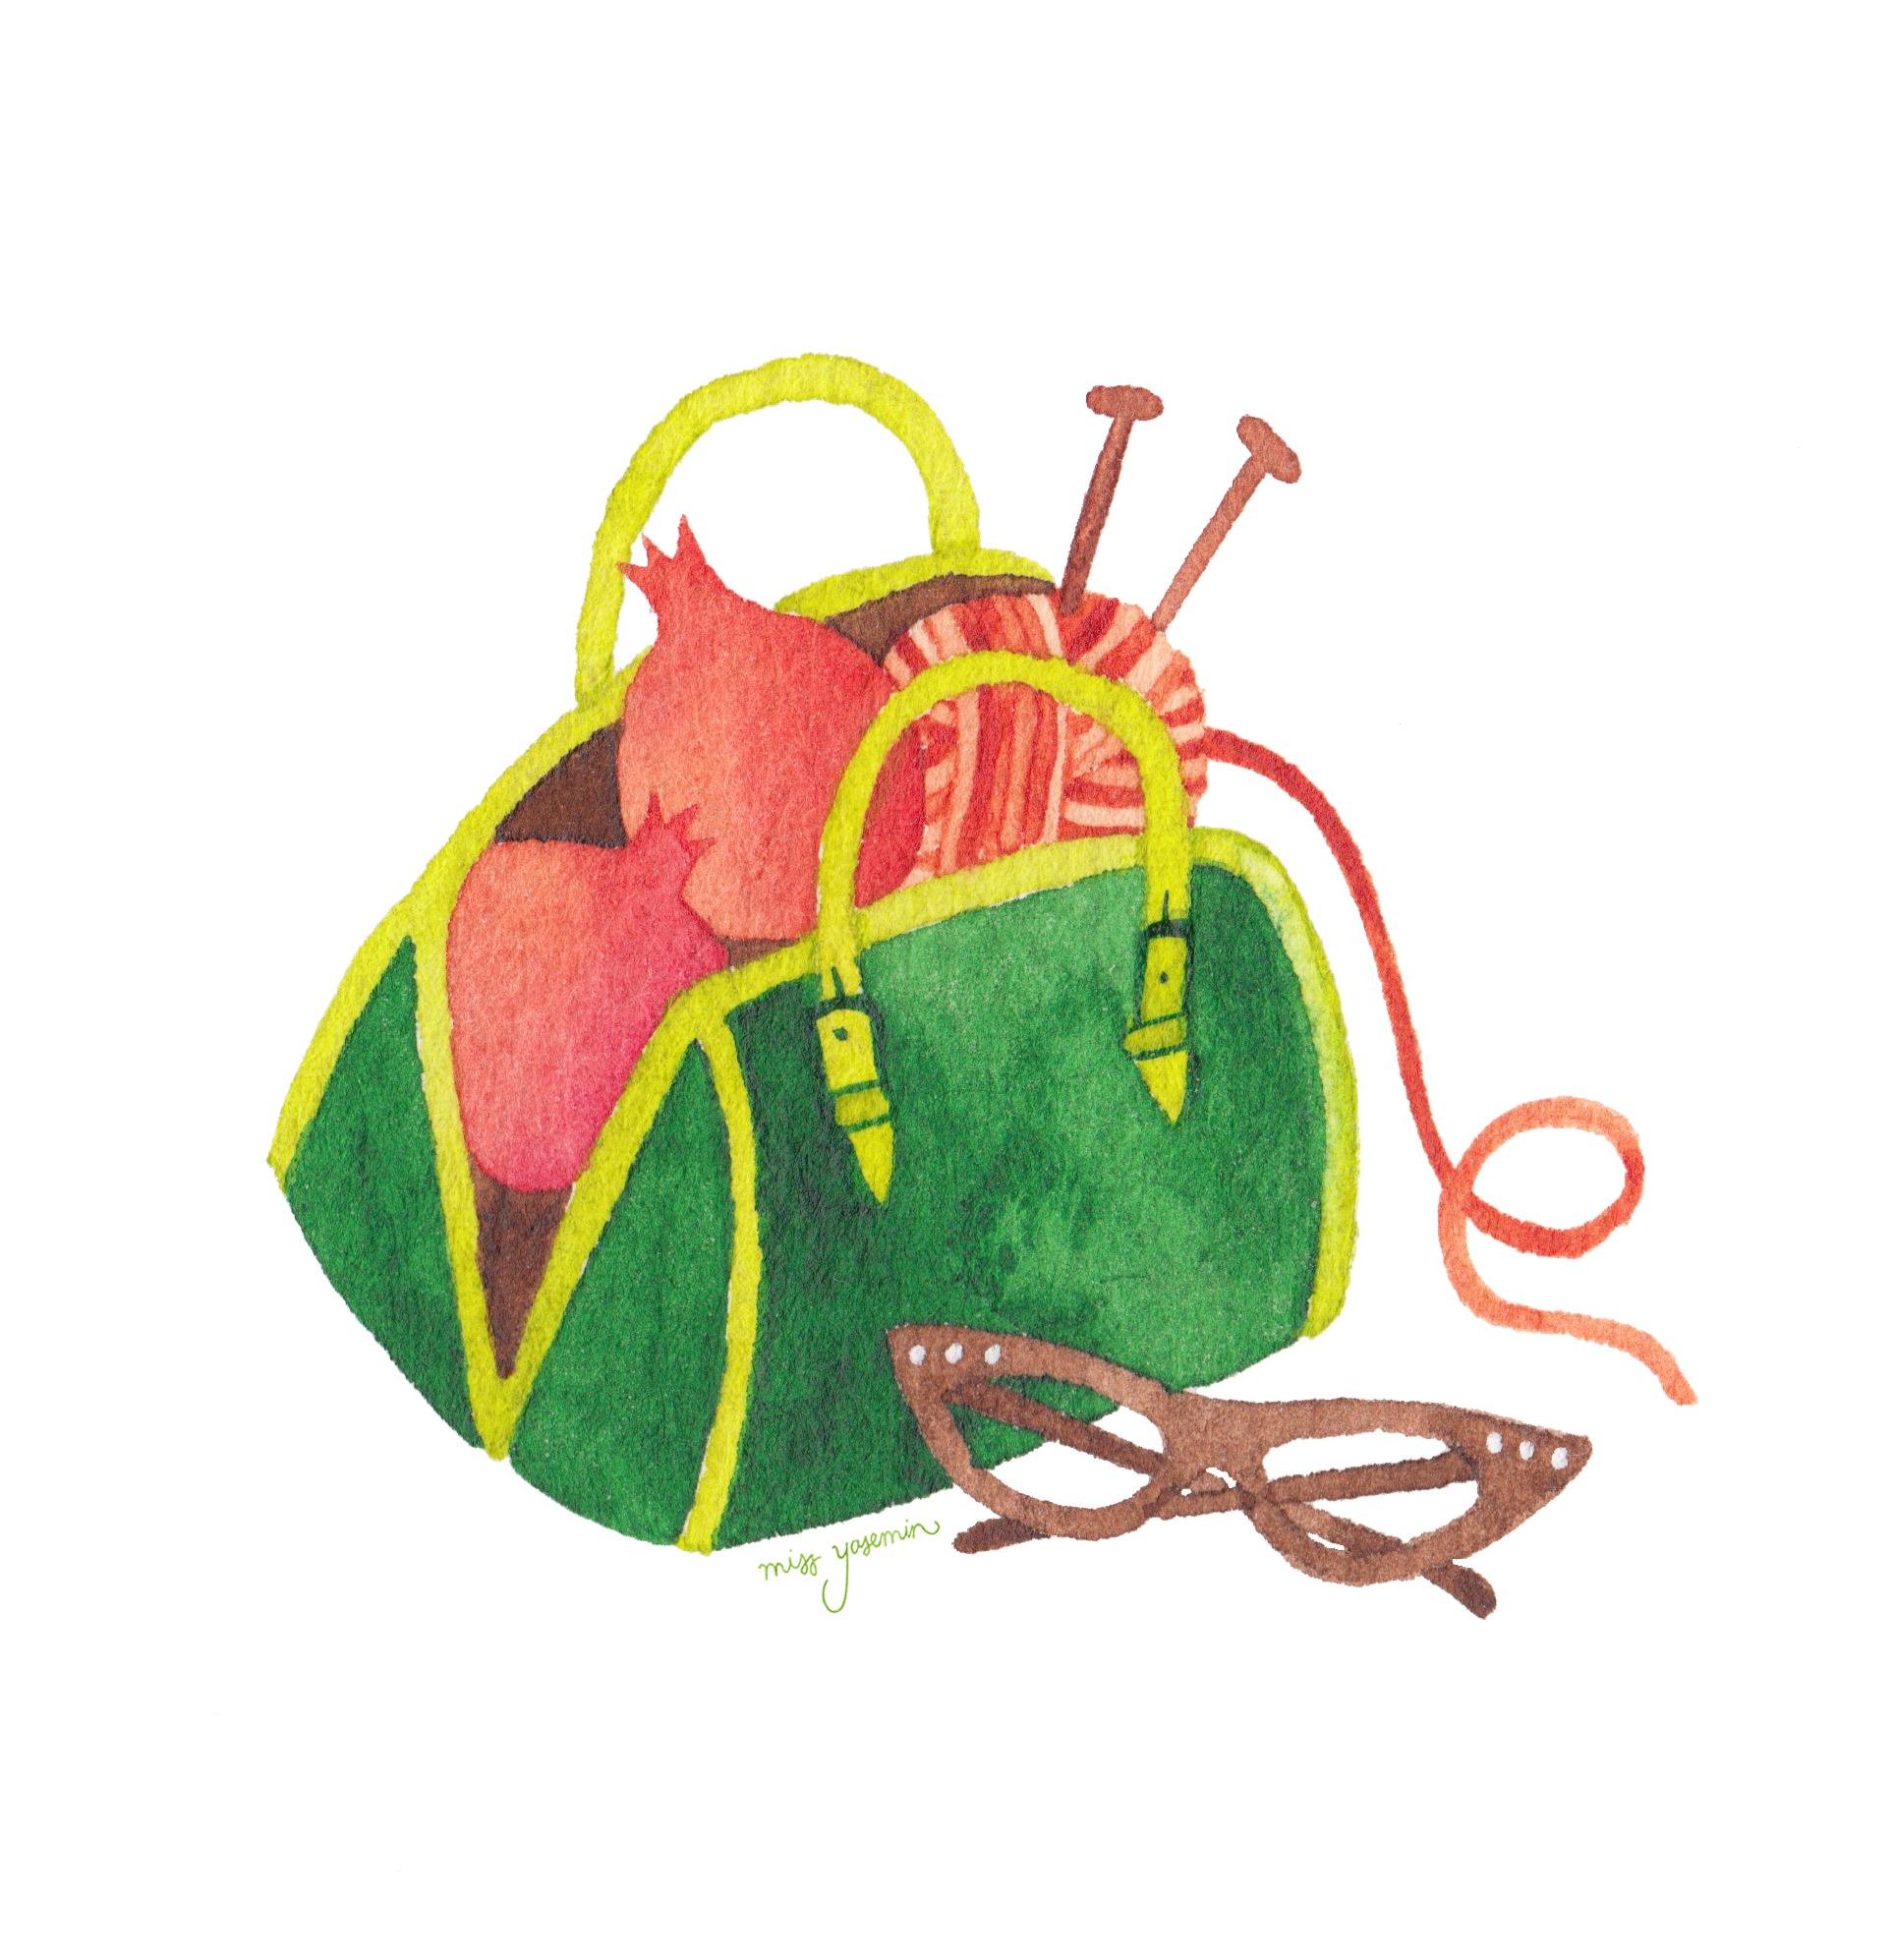 miss yasemin watercolour painting of handbag with pomegranate, sunglasses and knitting